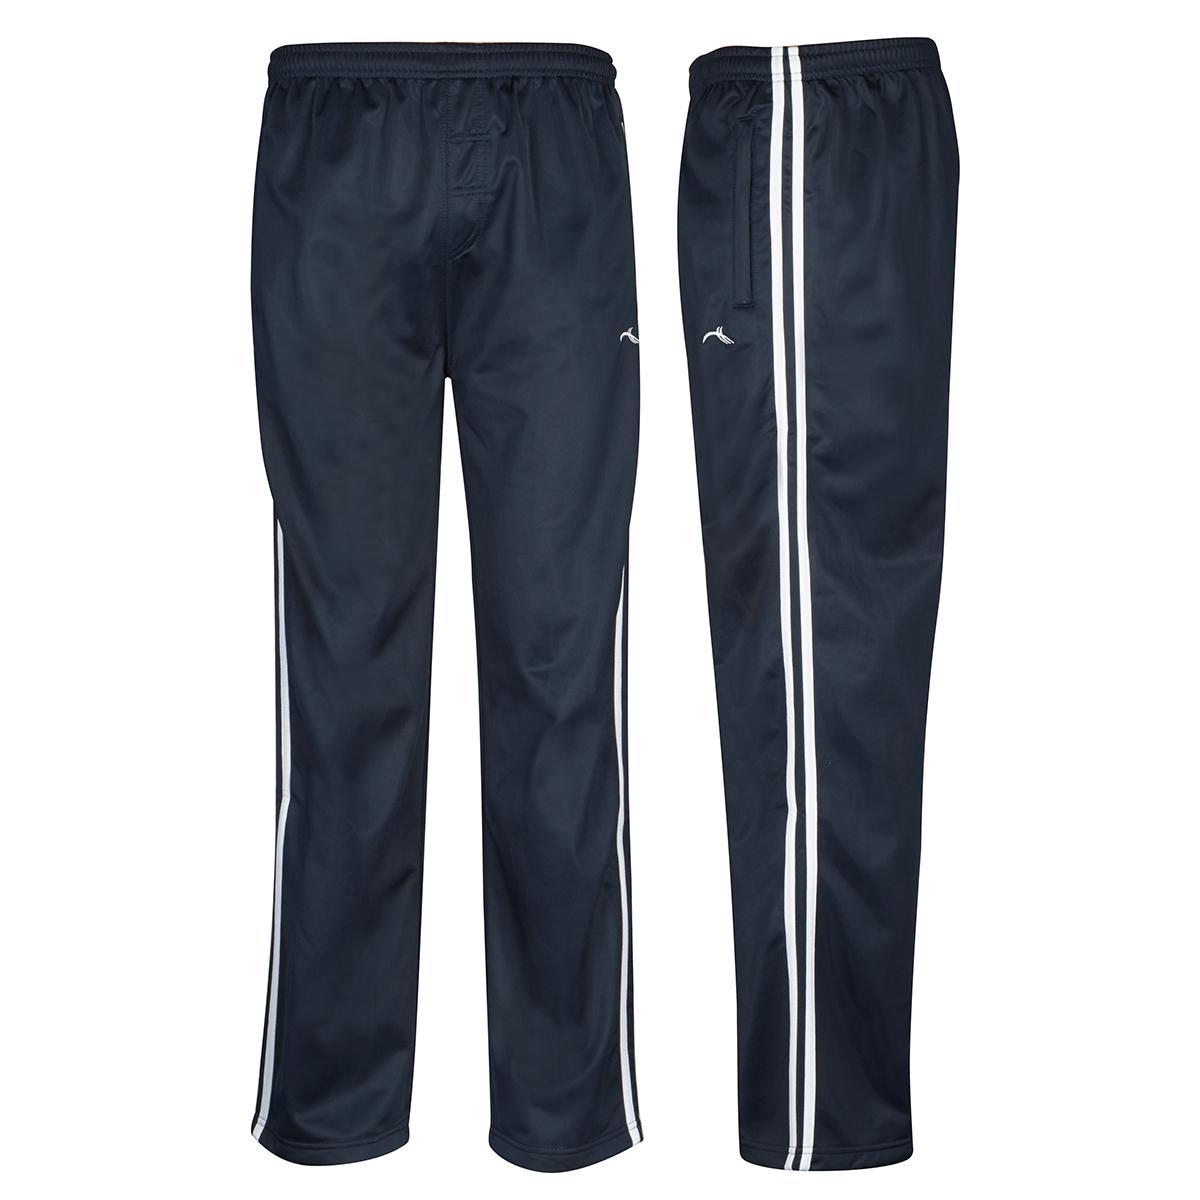 Mens Boys Tracksuit Track Pants Sports Bottoms Pant PE ...